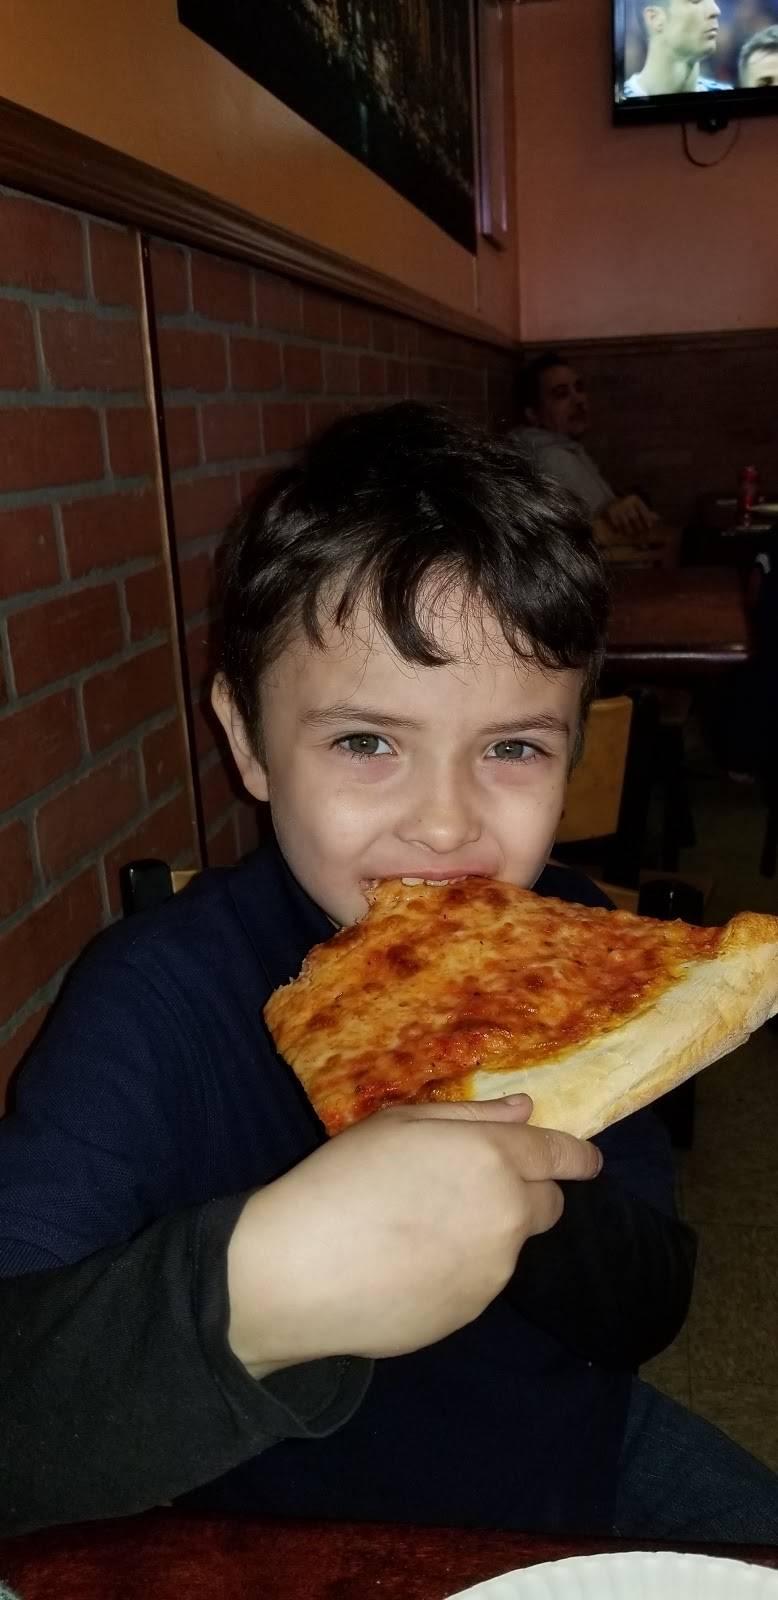 Joes Pizza | restaurant | 1858 Archer St # A, Bronx, NY 10460, USA | 7189310220 OR +1 718-931-0220